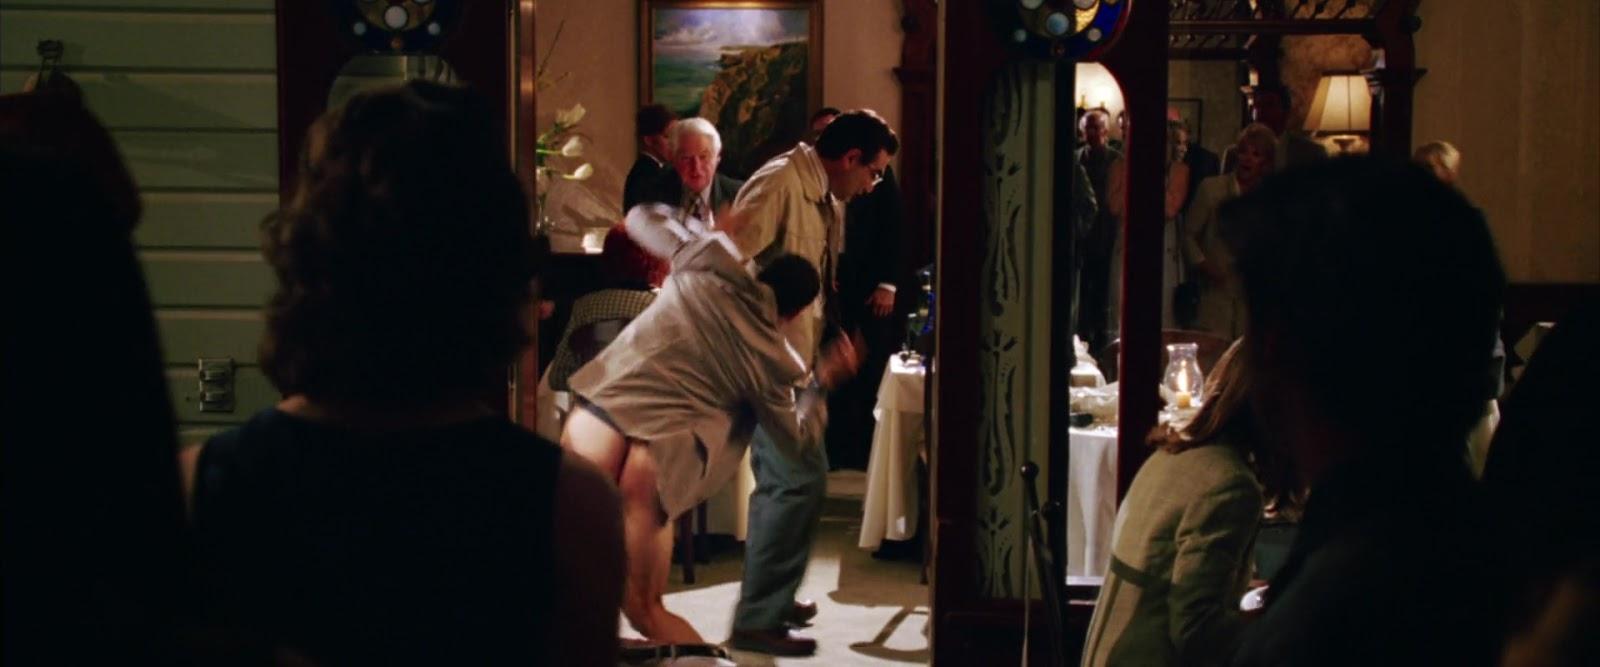 American Wedding Nude Scenes auscaps: jason biggs nude in american wedding